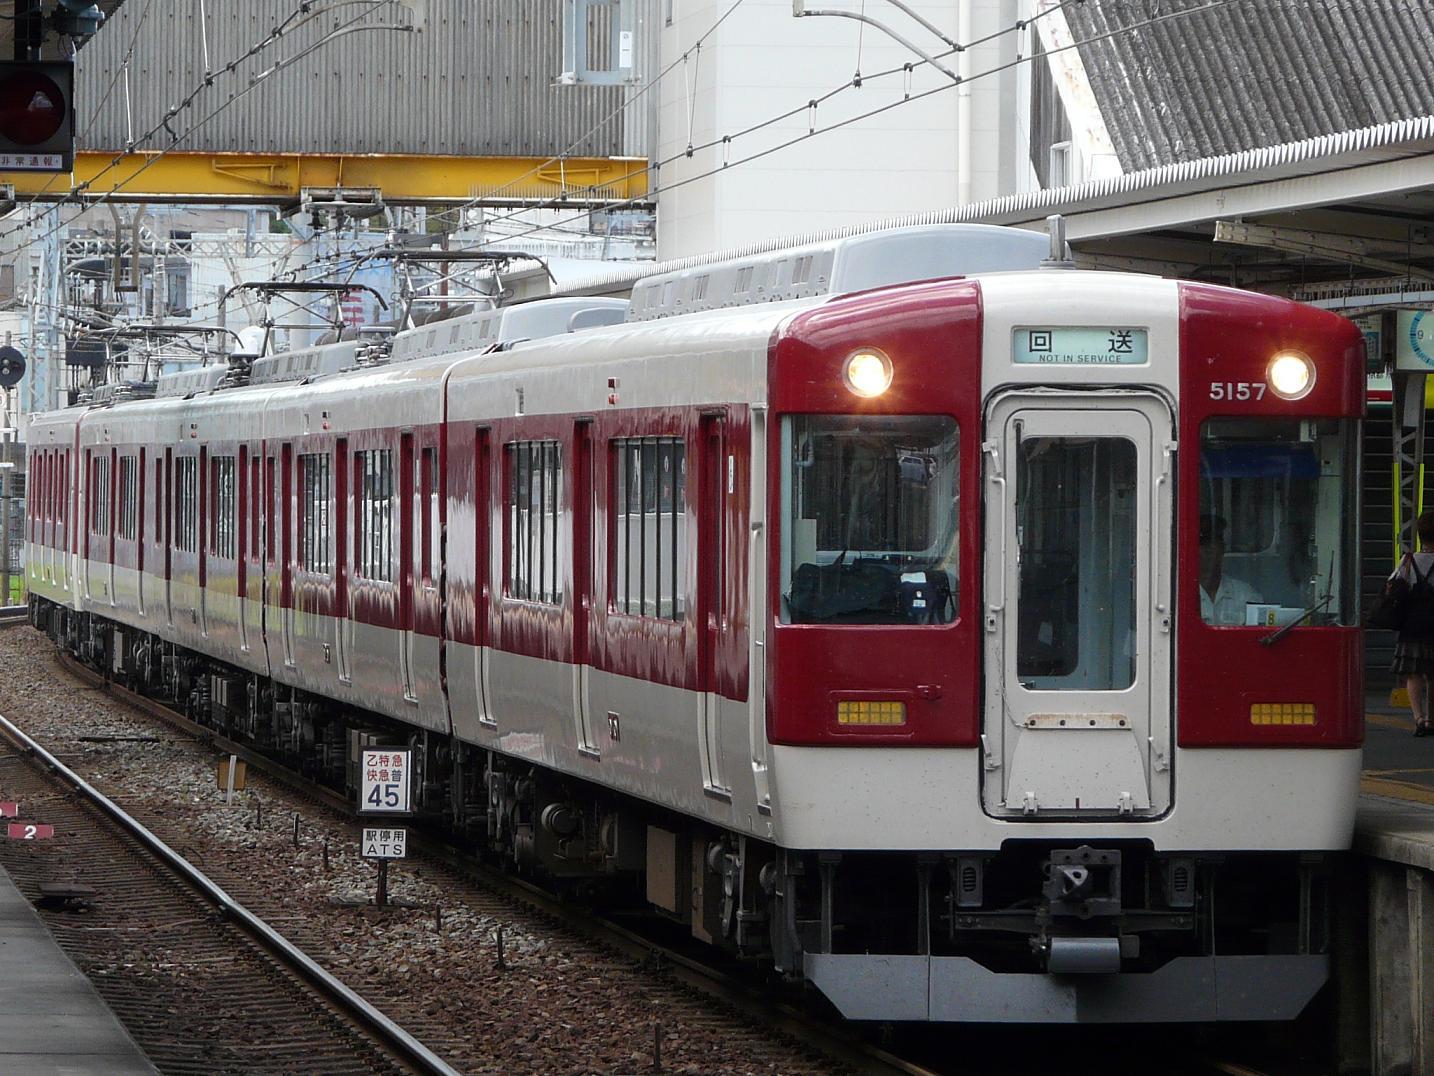 P1190753